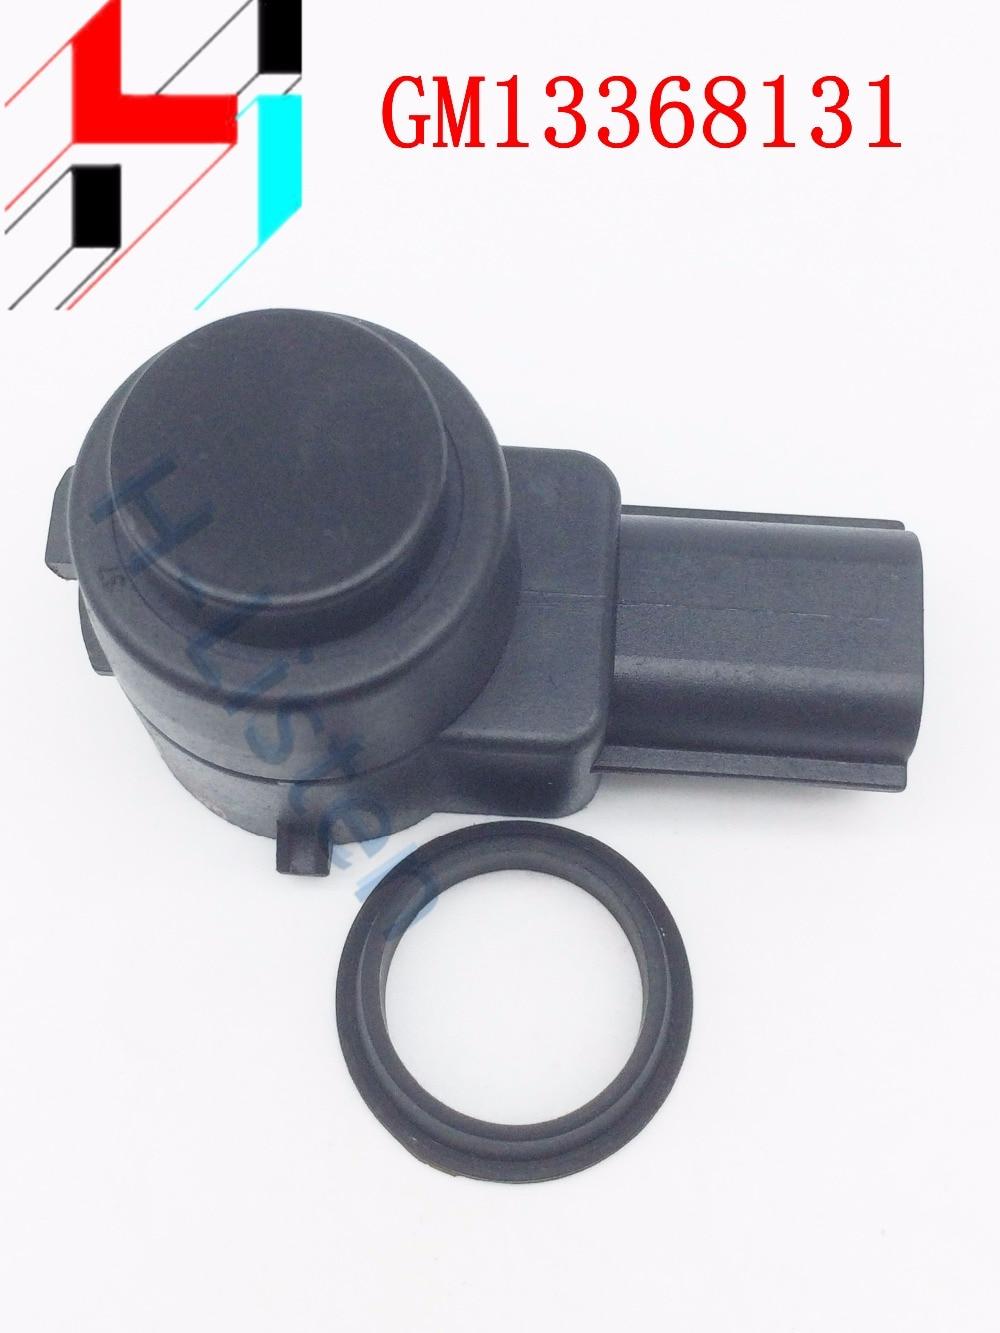 (4PCS) 13368131 13242365 100% Original Parking PDC Ultrasonic Sensor For Opel Cruze OE#0263013679 Genuine!